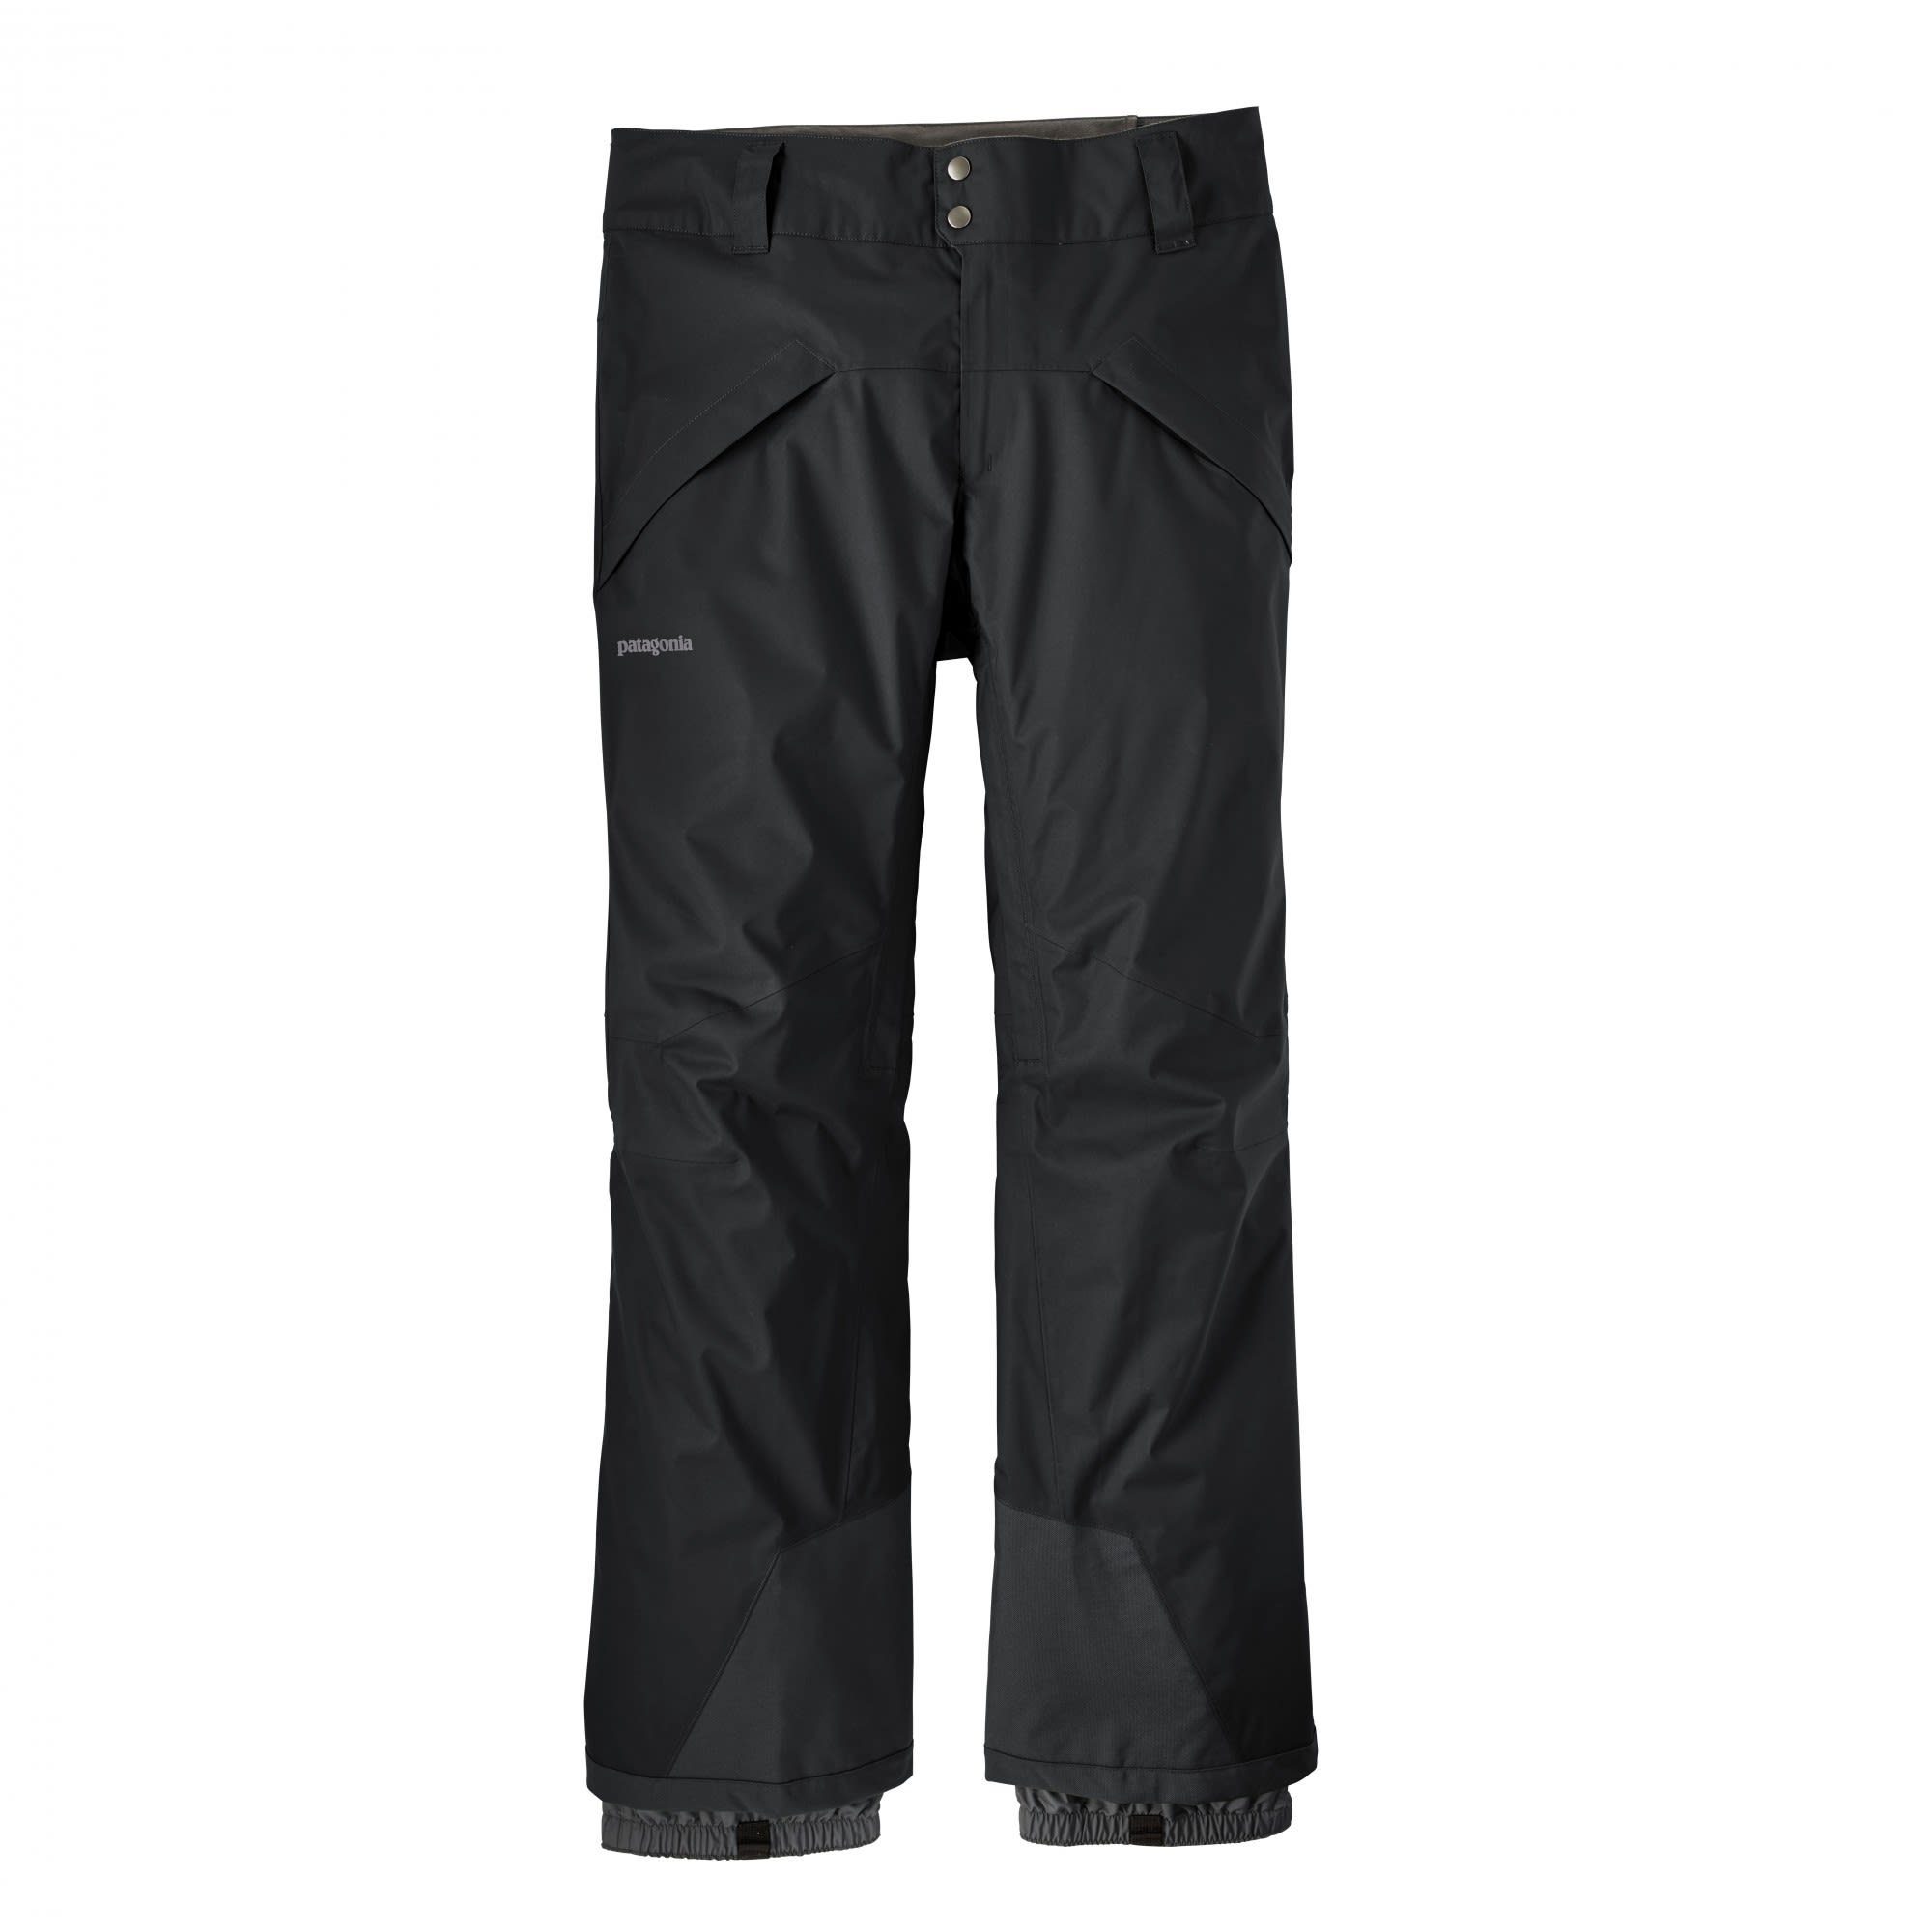 Patagonia Snowshot Pants Schwarz, Male Hose, L